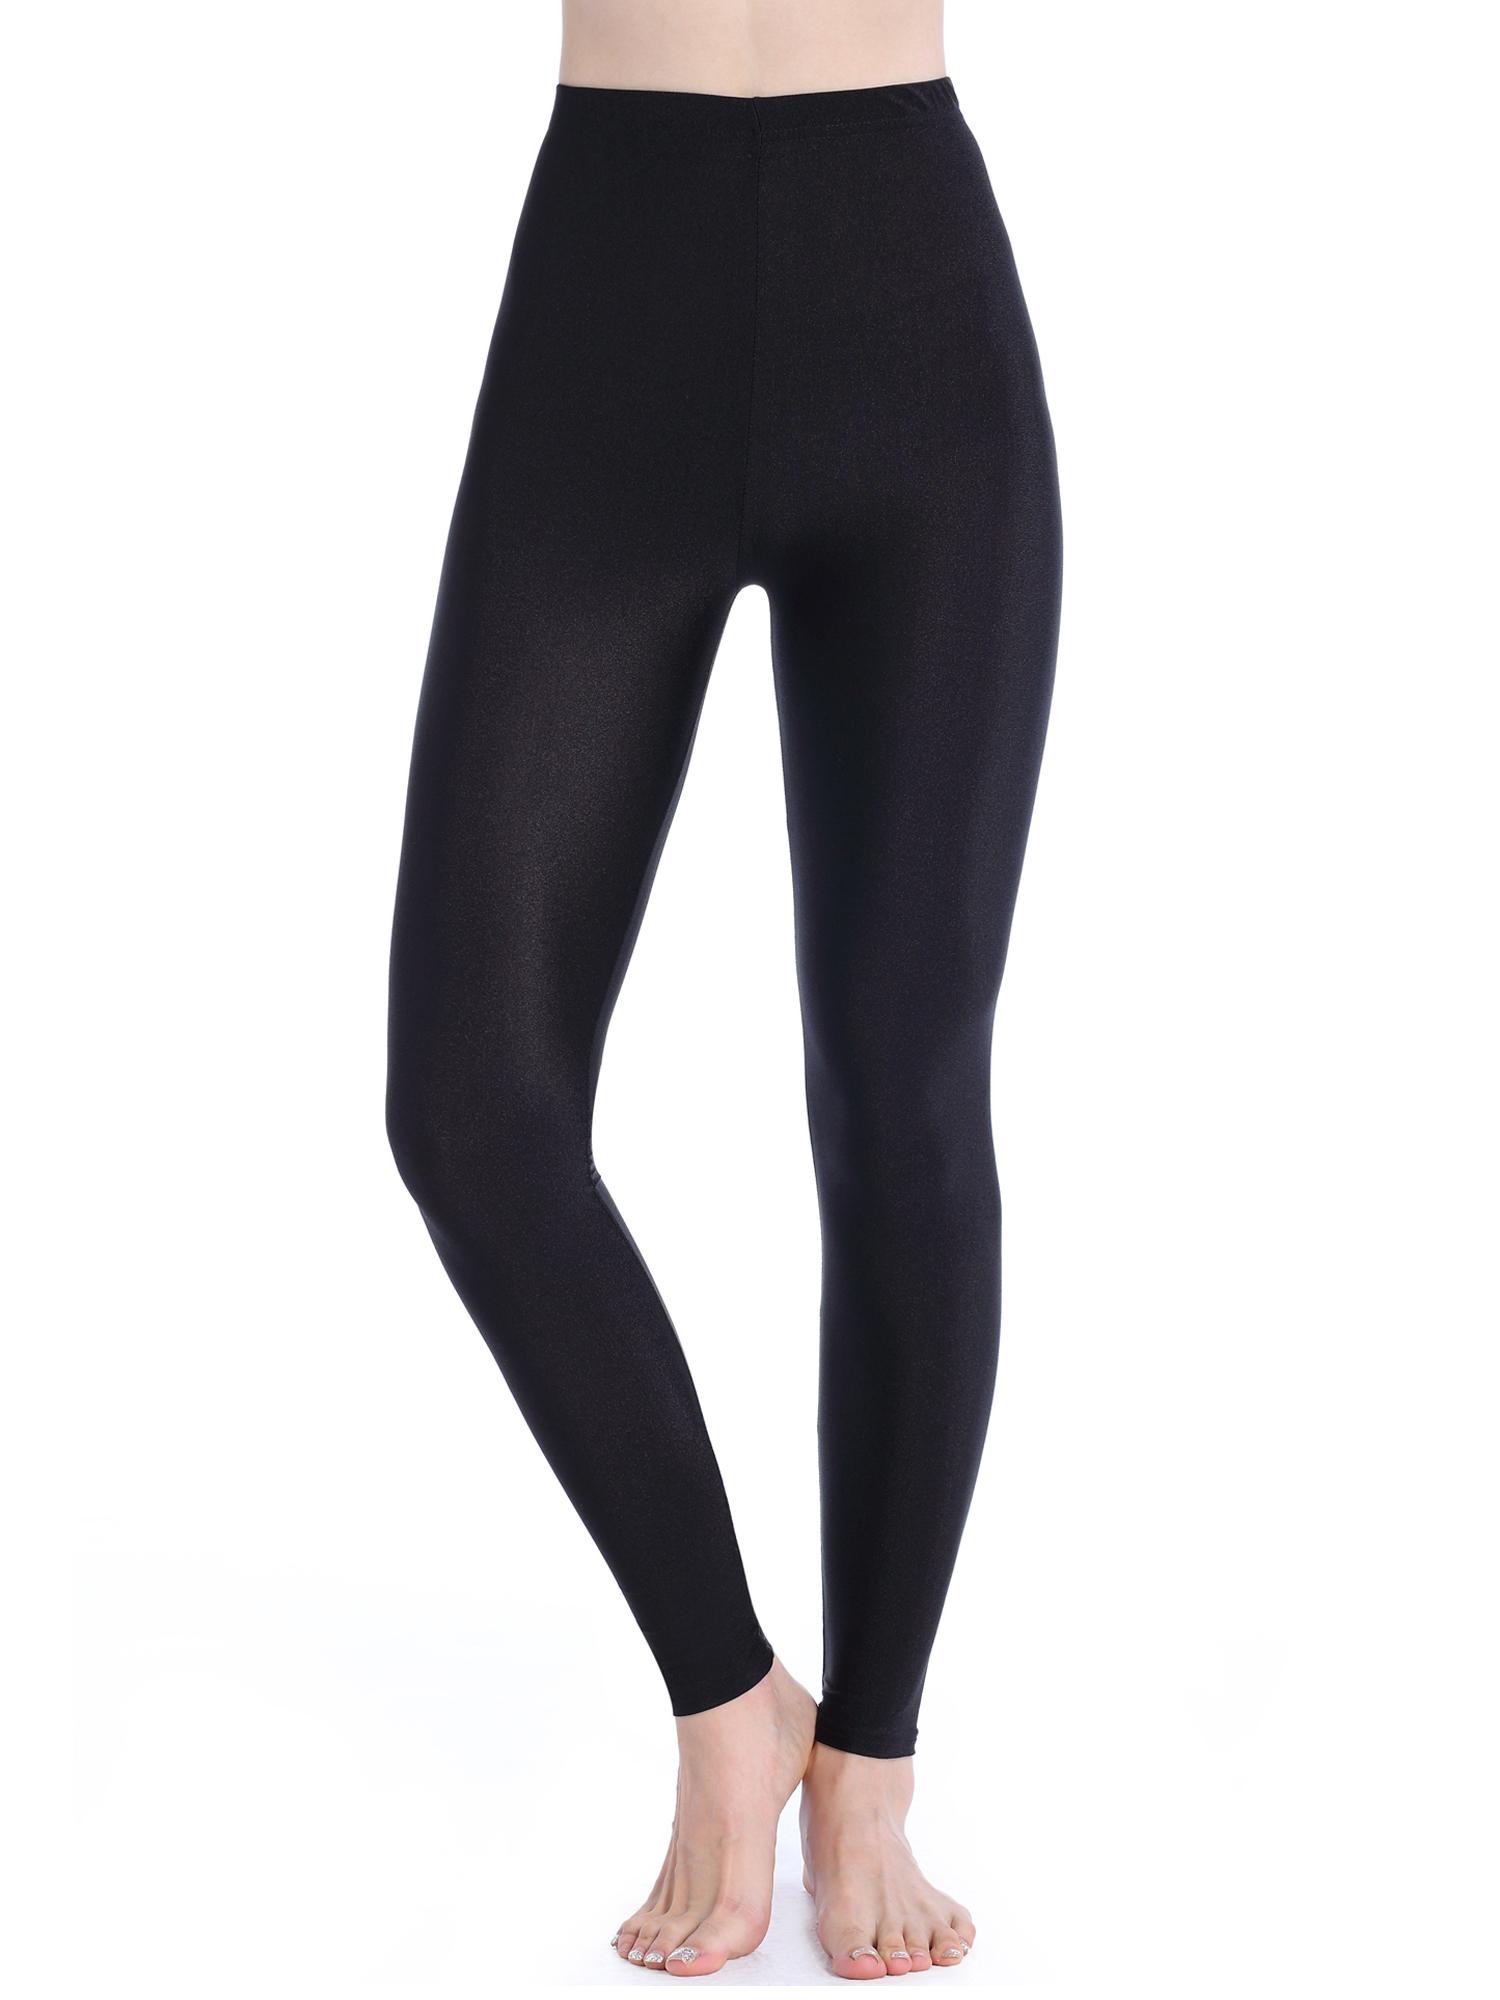 477e86eed76 SAYFUT - SAYFUT Women Basic Leggings Stretch Yoga Pants High Waist Tummy  Control Workout Fitness Yoga Trouser Black - Walmart.com